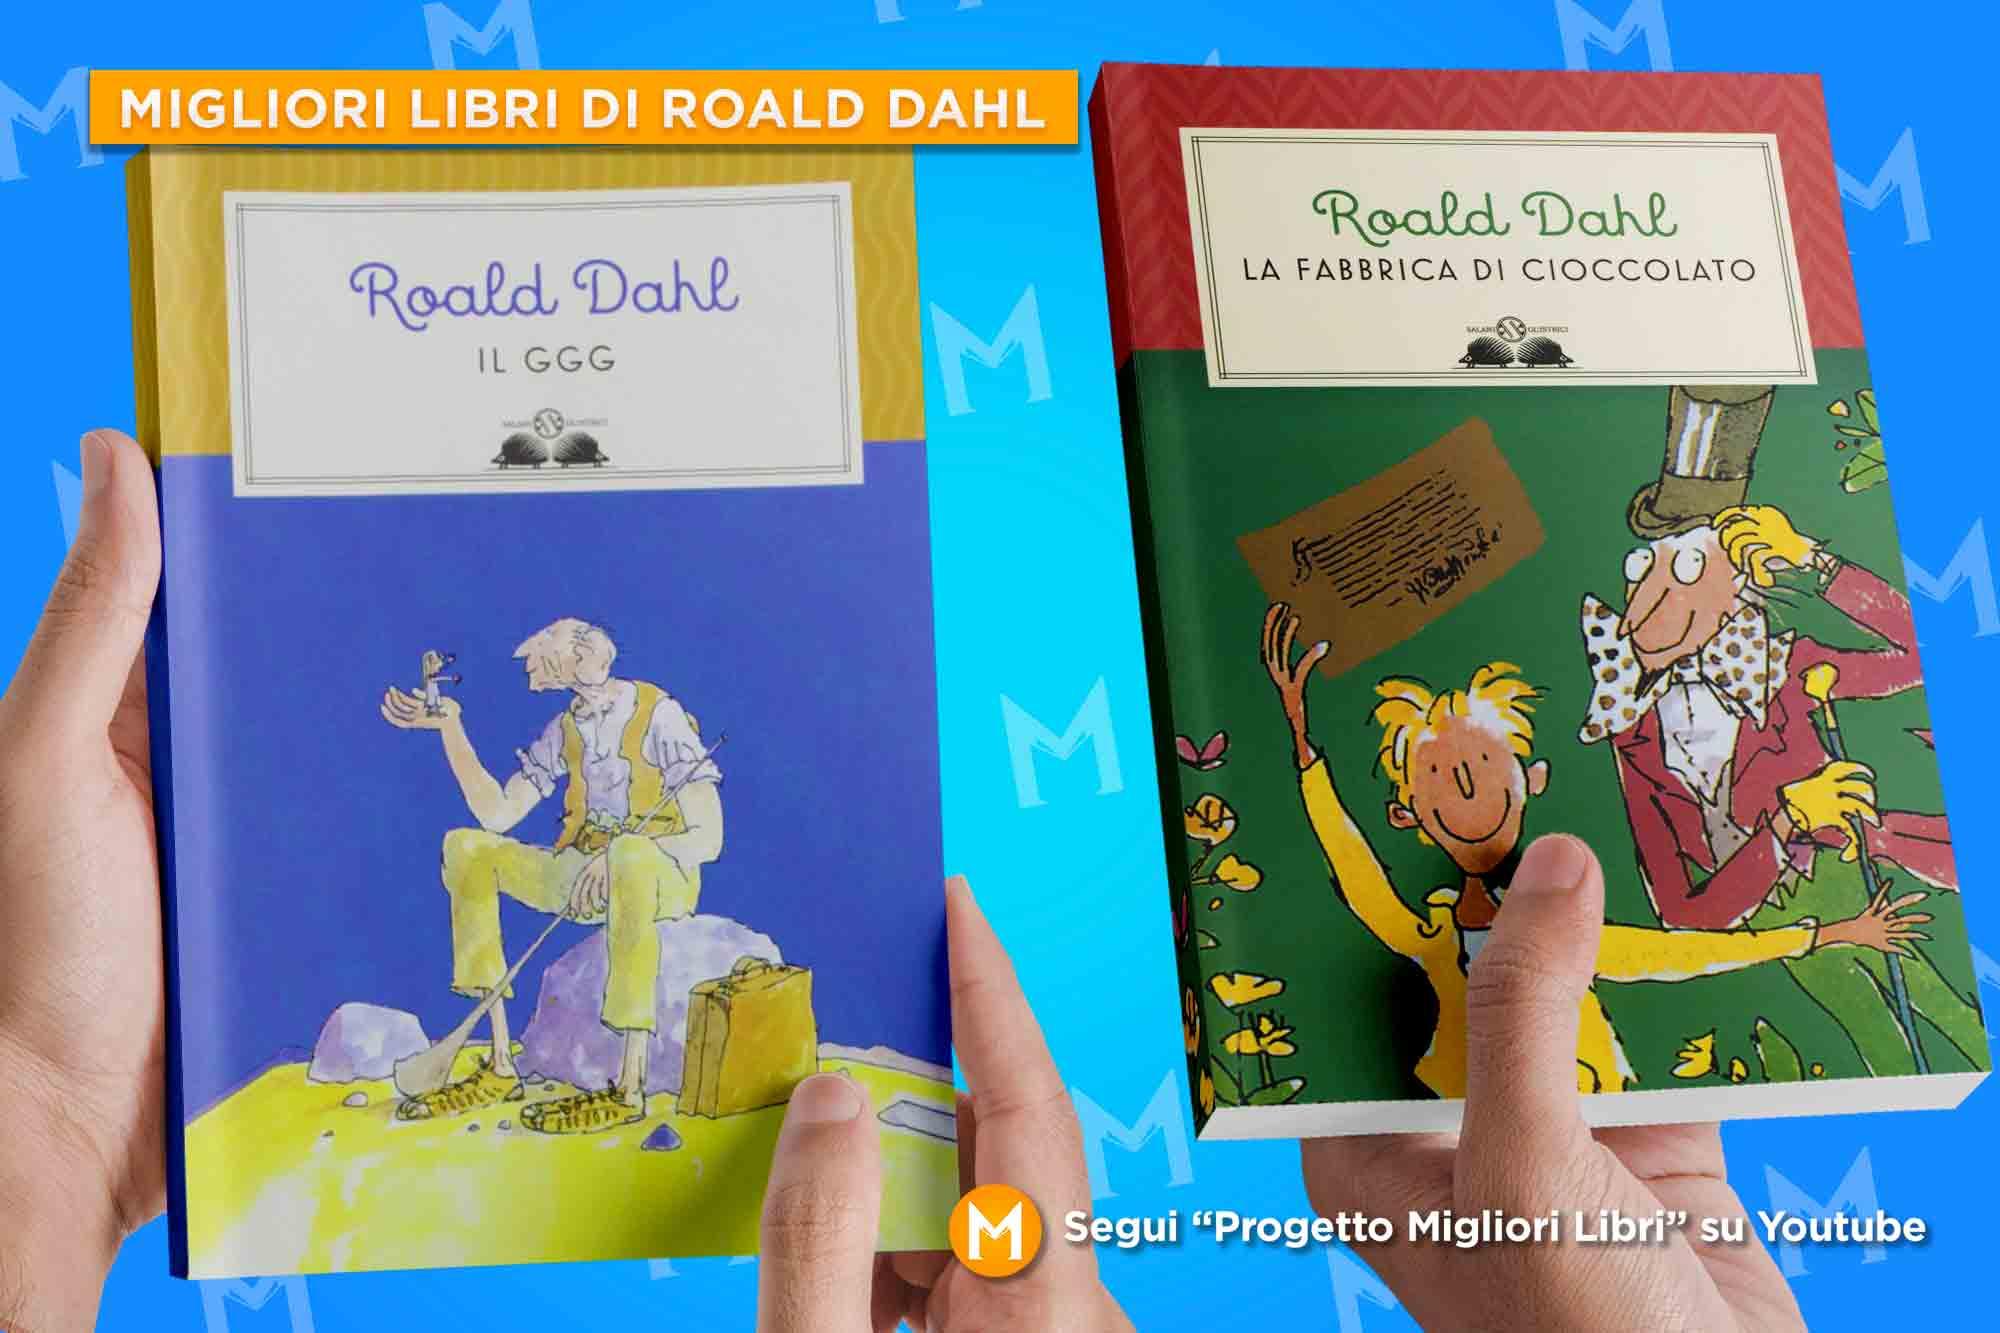 migliori-libri-roald-dahl